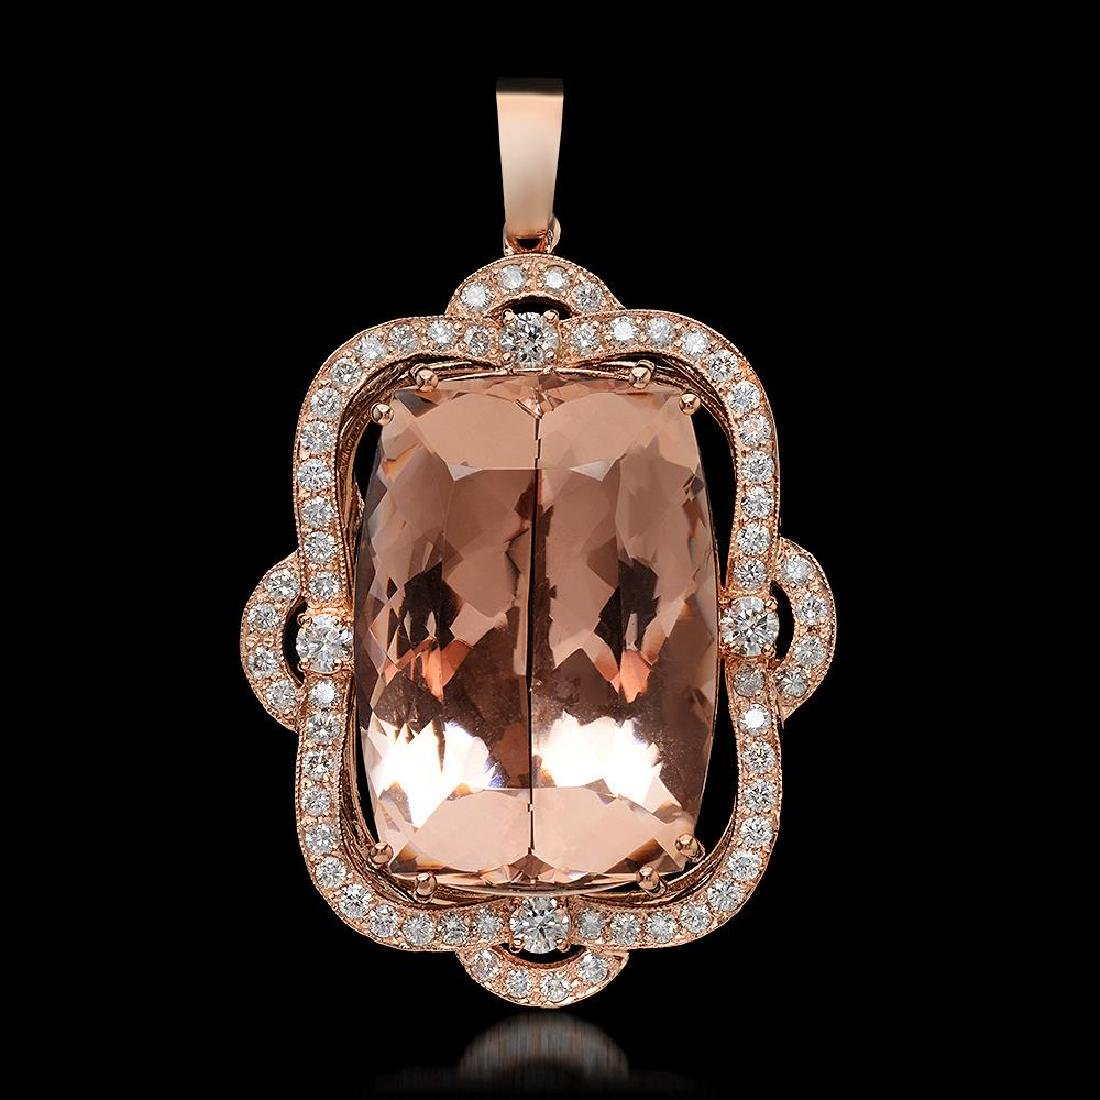 14K Gold 46.68ct Morganite 2.07ct Diamond Pendant